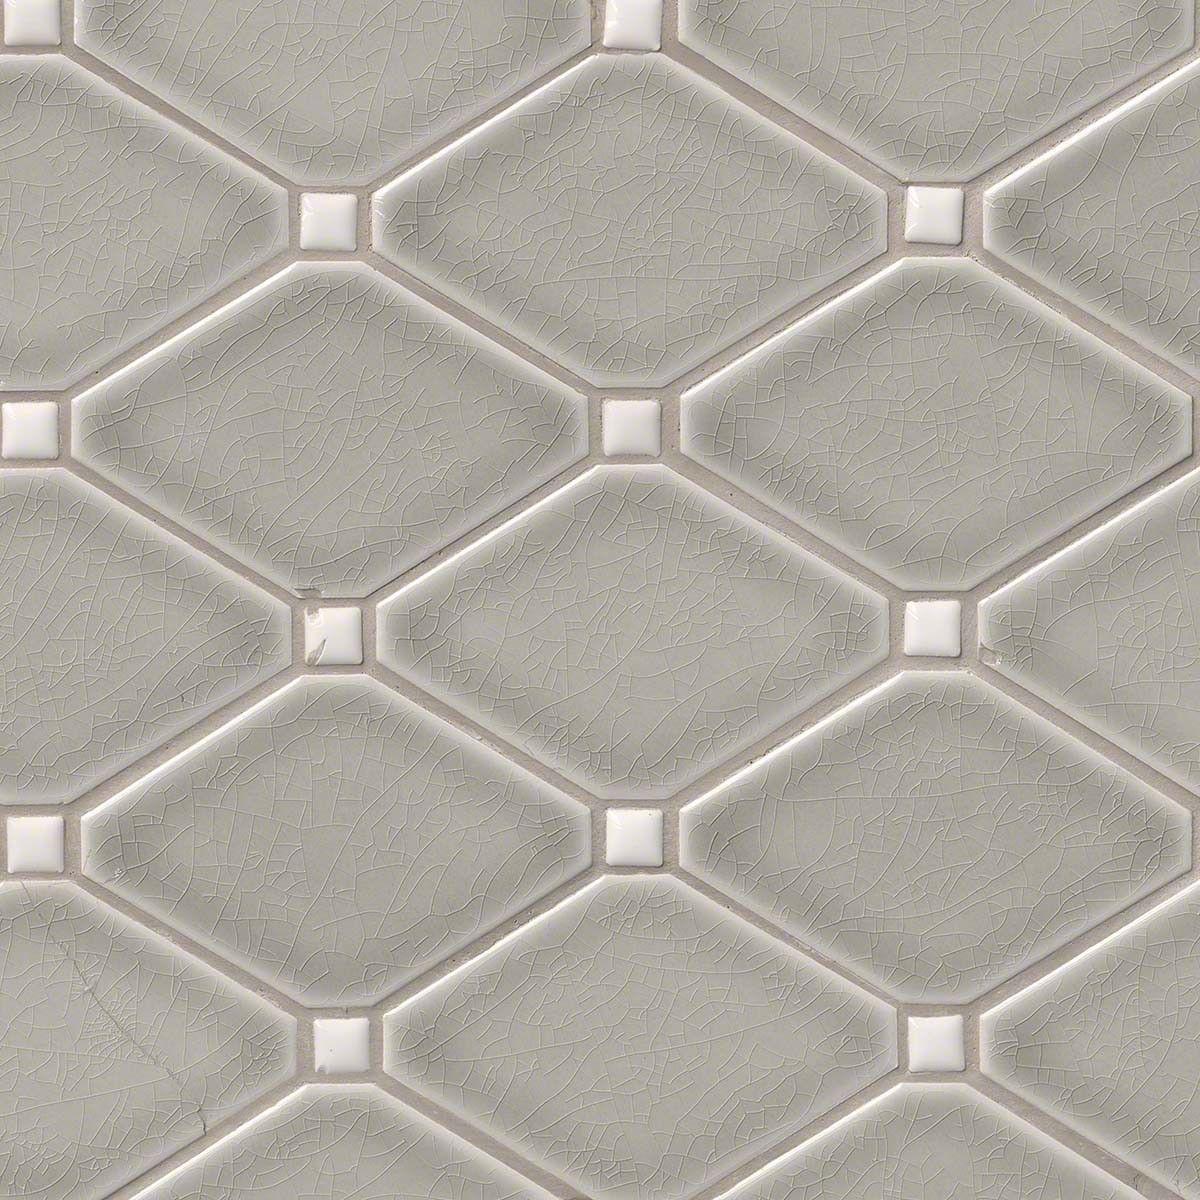 Dove Gray Diamond 8mm Mosaic Tile Diamond Tile Diamond Backsplash Ceramic Mosaic Tile